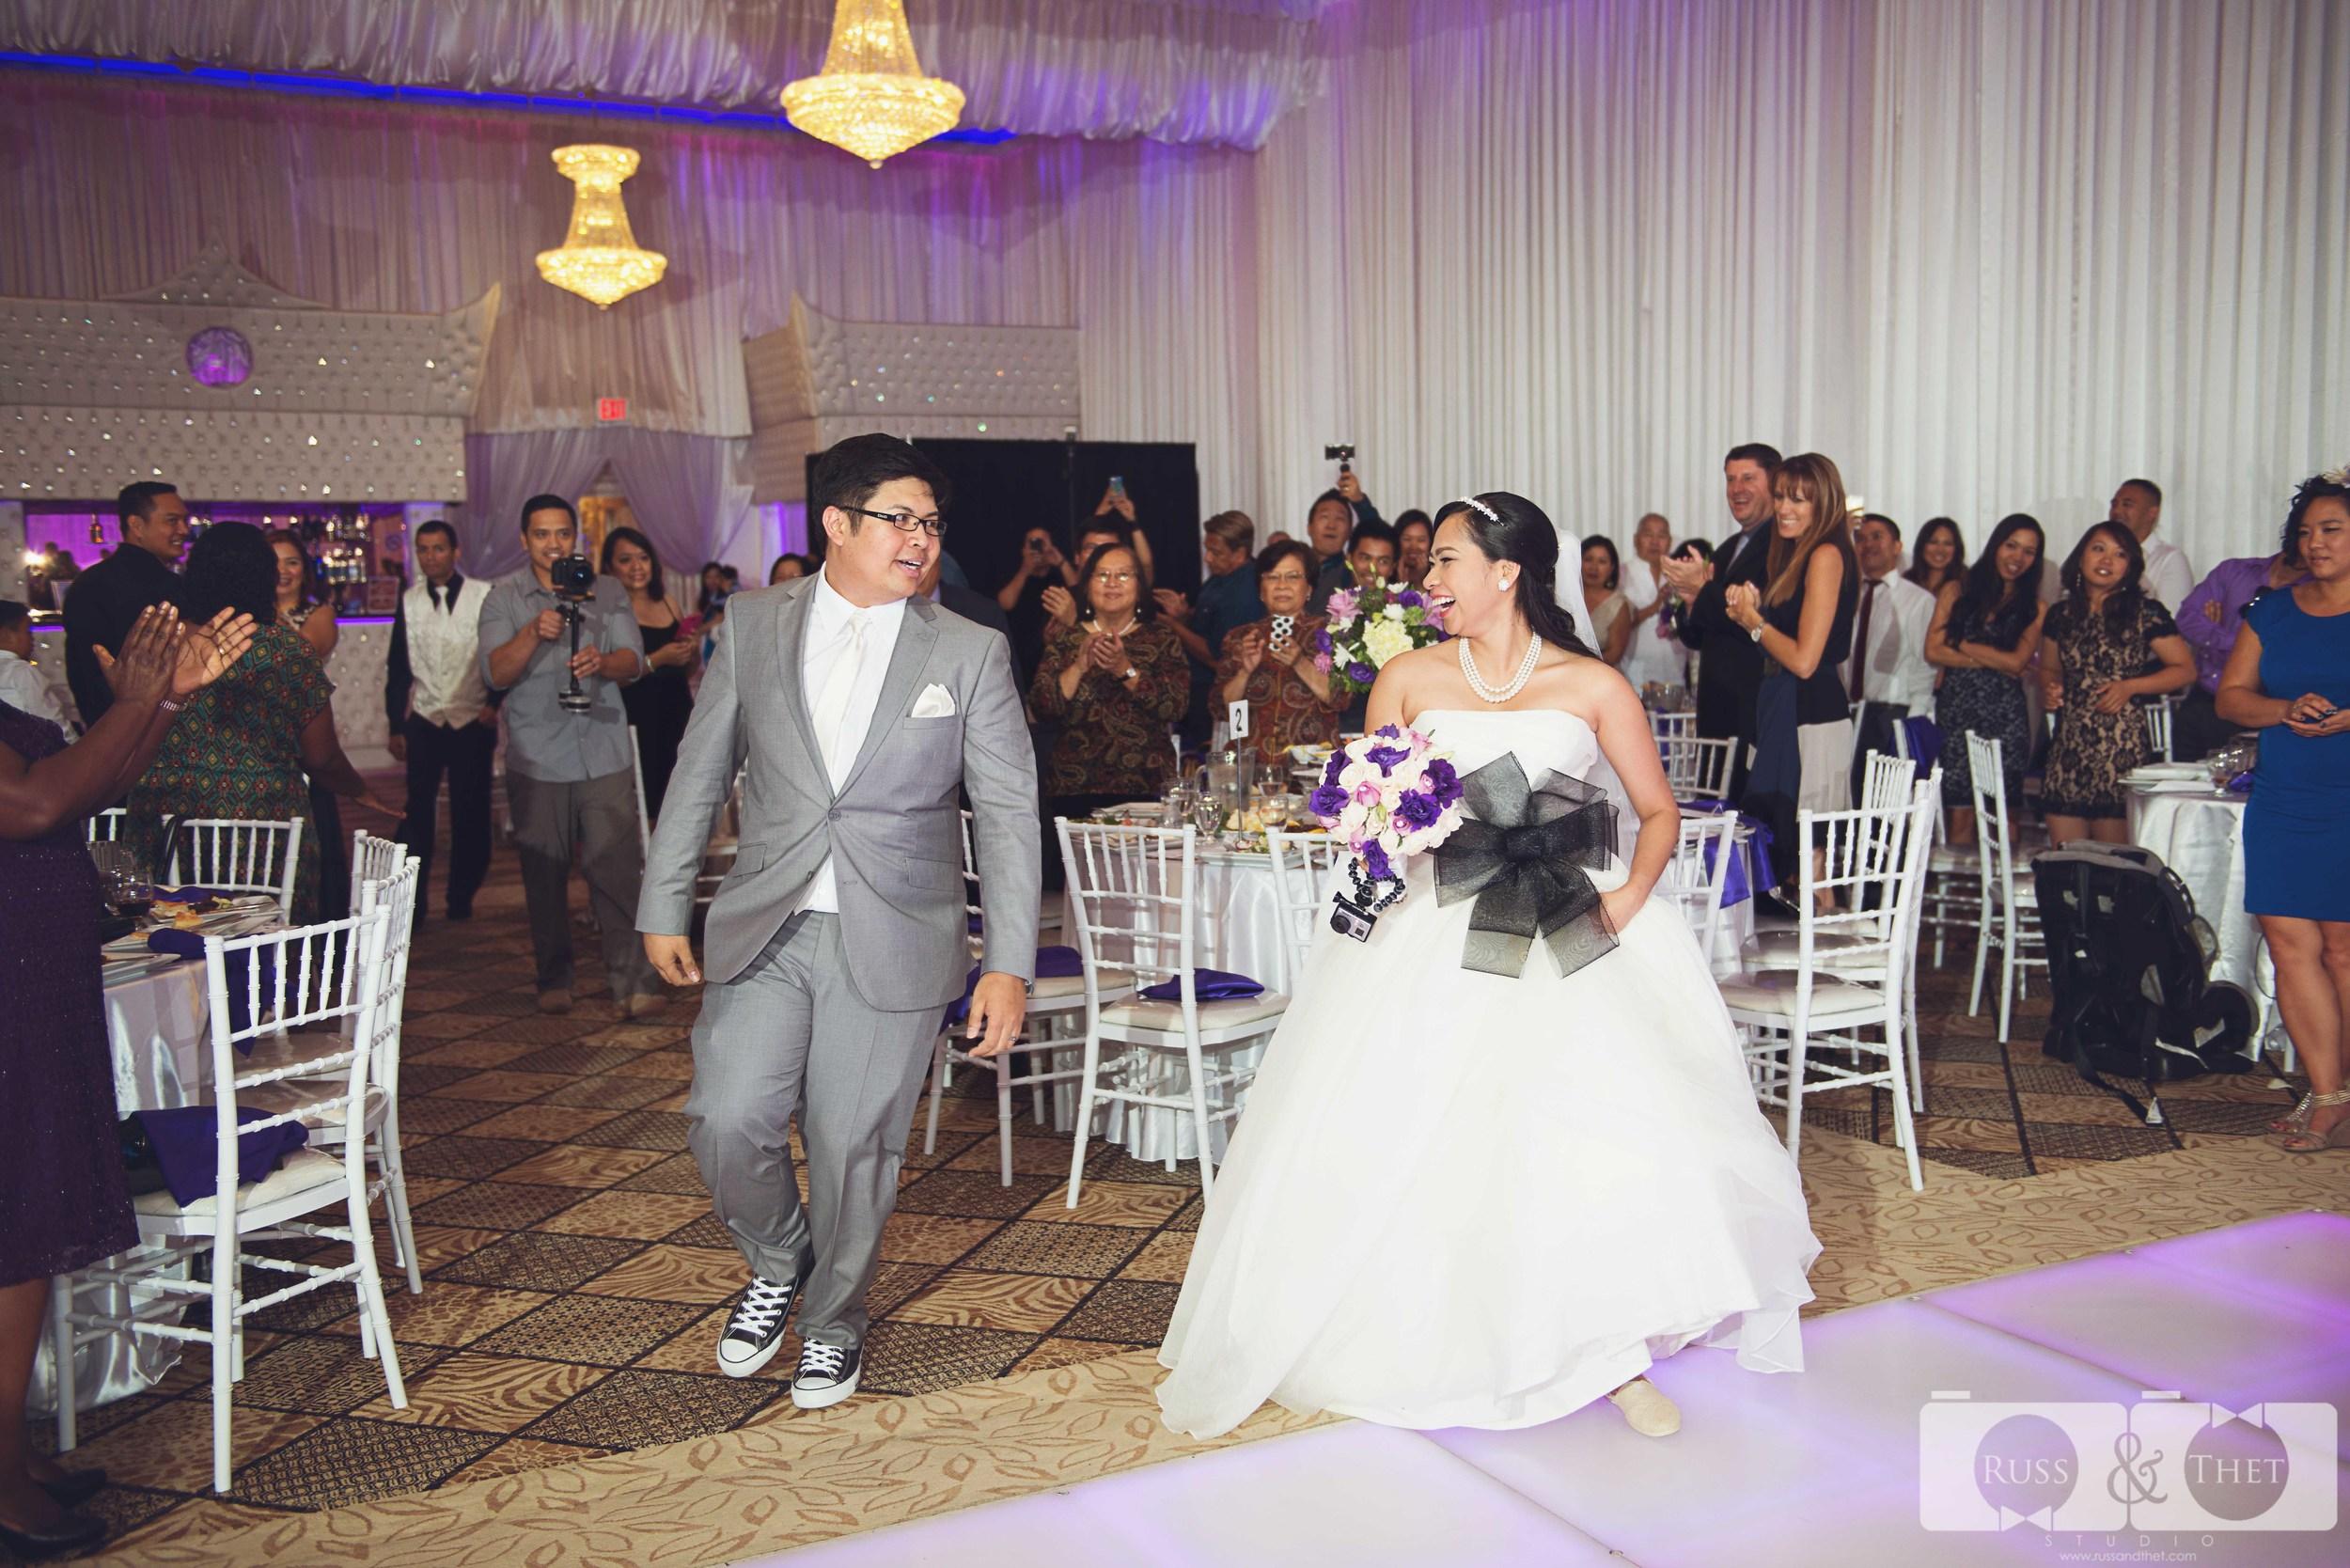 royal-palace-banquet-hall-glendale-wedding-52.JPG